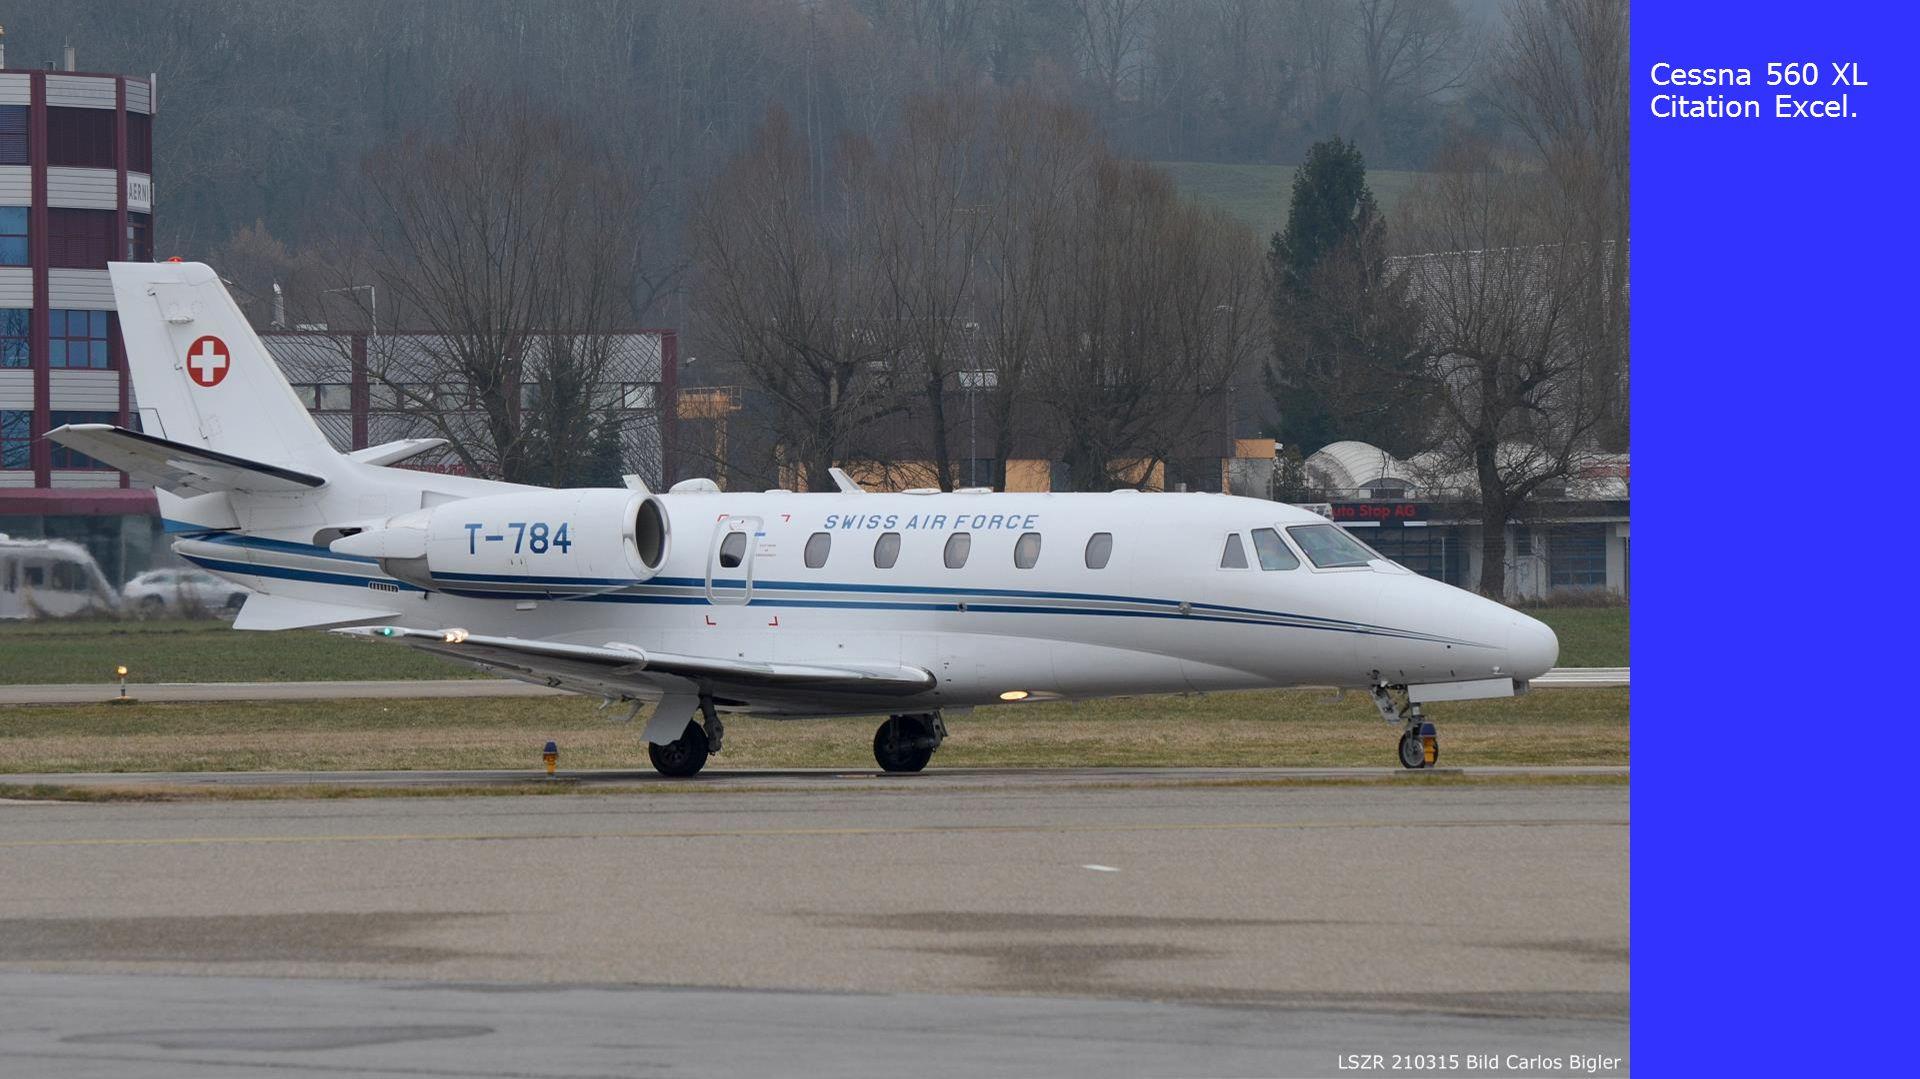 Cessna 560 XL Citation Excel.